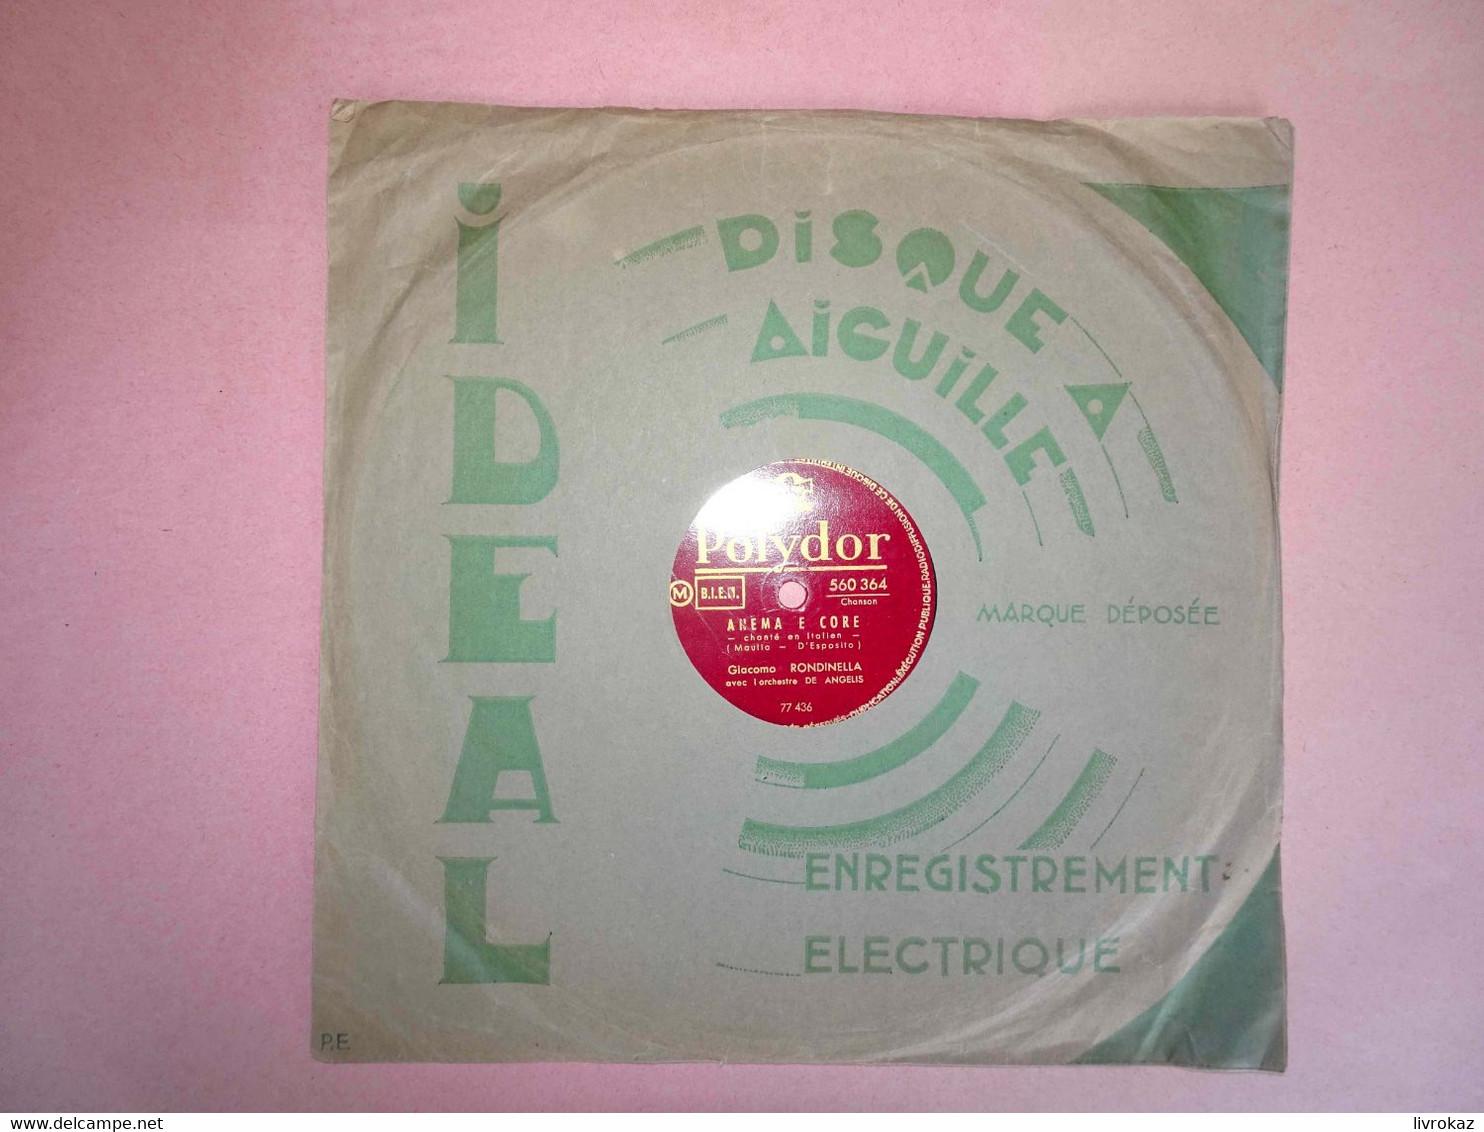 Disque 78 Tours Polydor, Chants Italiens Luna Rossa, Anema E Core, G. Rondinella Et L'orchestre De Angelis - 78 G - Dischi Per Fonografi